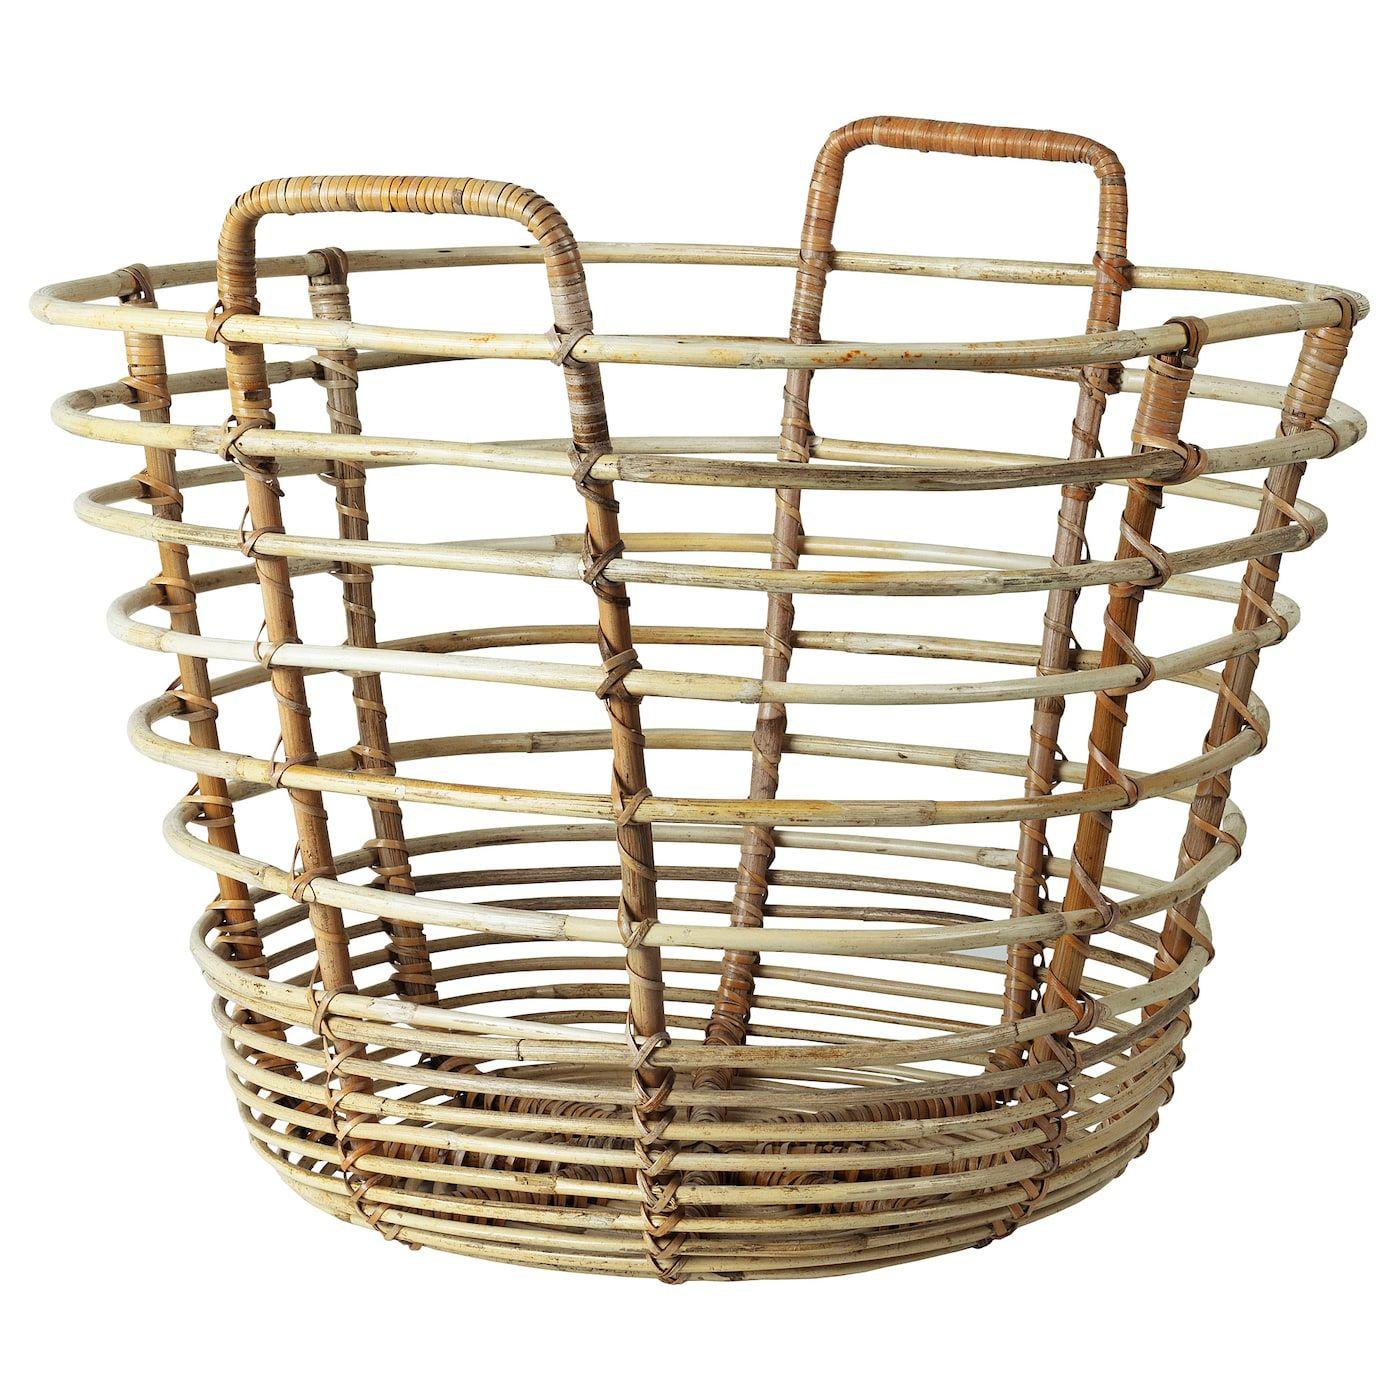 Ikea Solblekt Basket With Handles Rattan This Generous Basket Is Perfect For Warm Blankets On The Terrace Wet Towels O Wicker Baskets Storage Basket Ikea